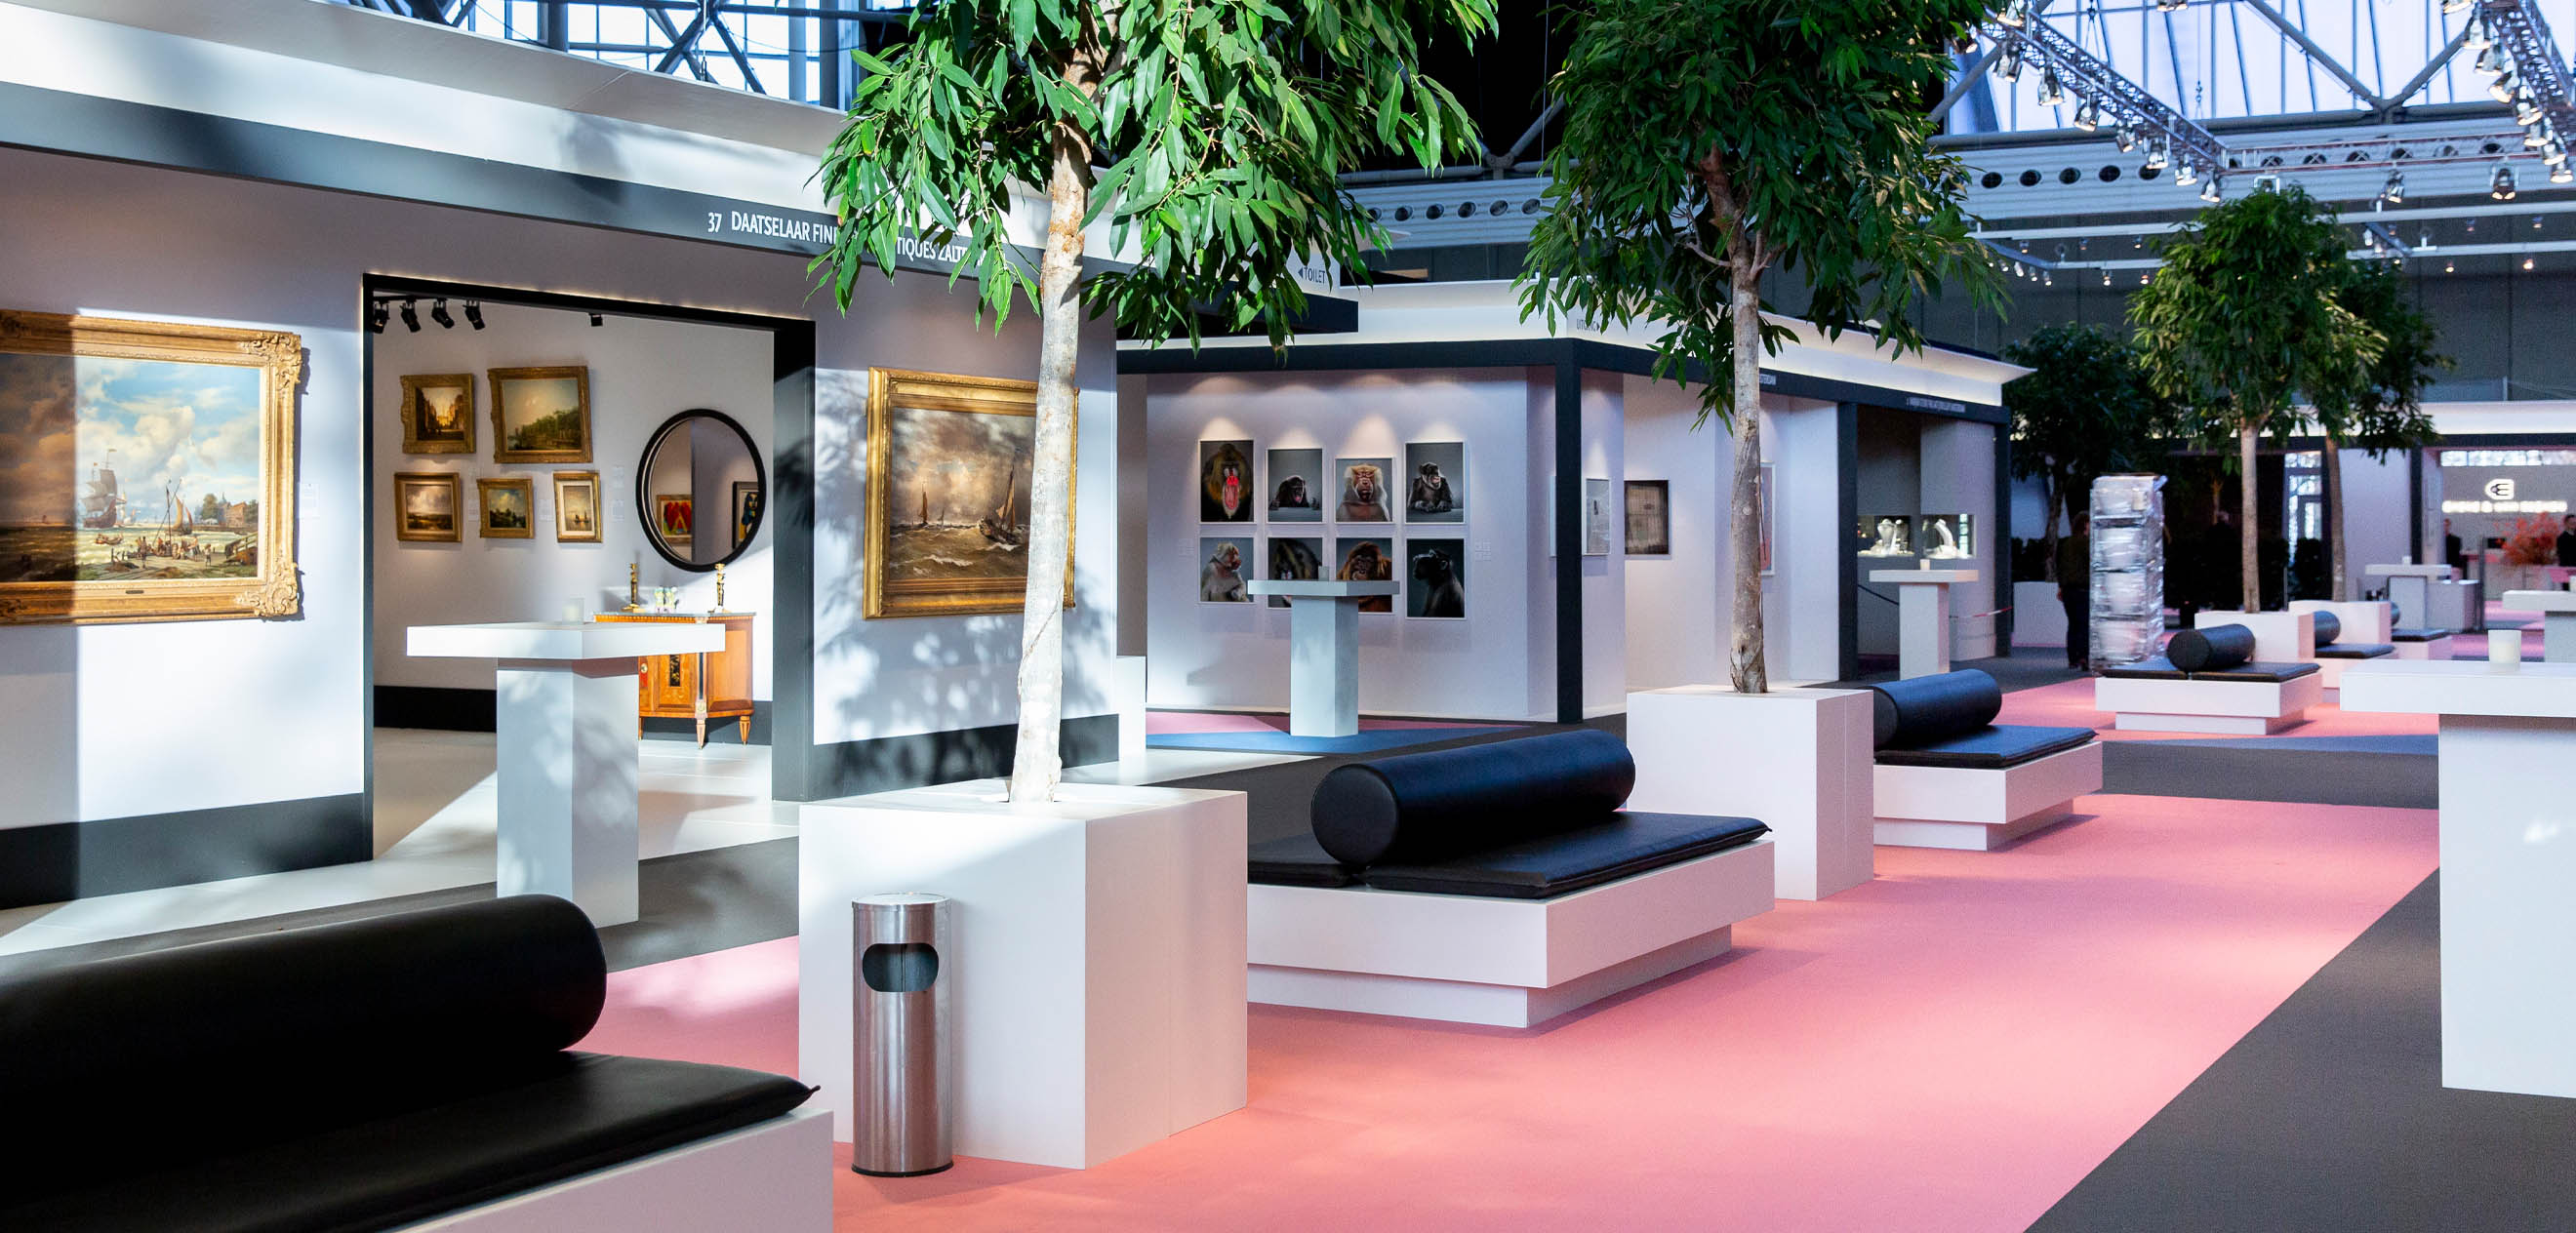 PAN Amsterdam, Amsterdam, 2018, beurs, kunst, art, fair, antiek, design, grafisch, ontwerp, grafisch ontwerp, graphic design, campagne, erwin olaf, fotografie